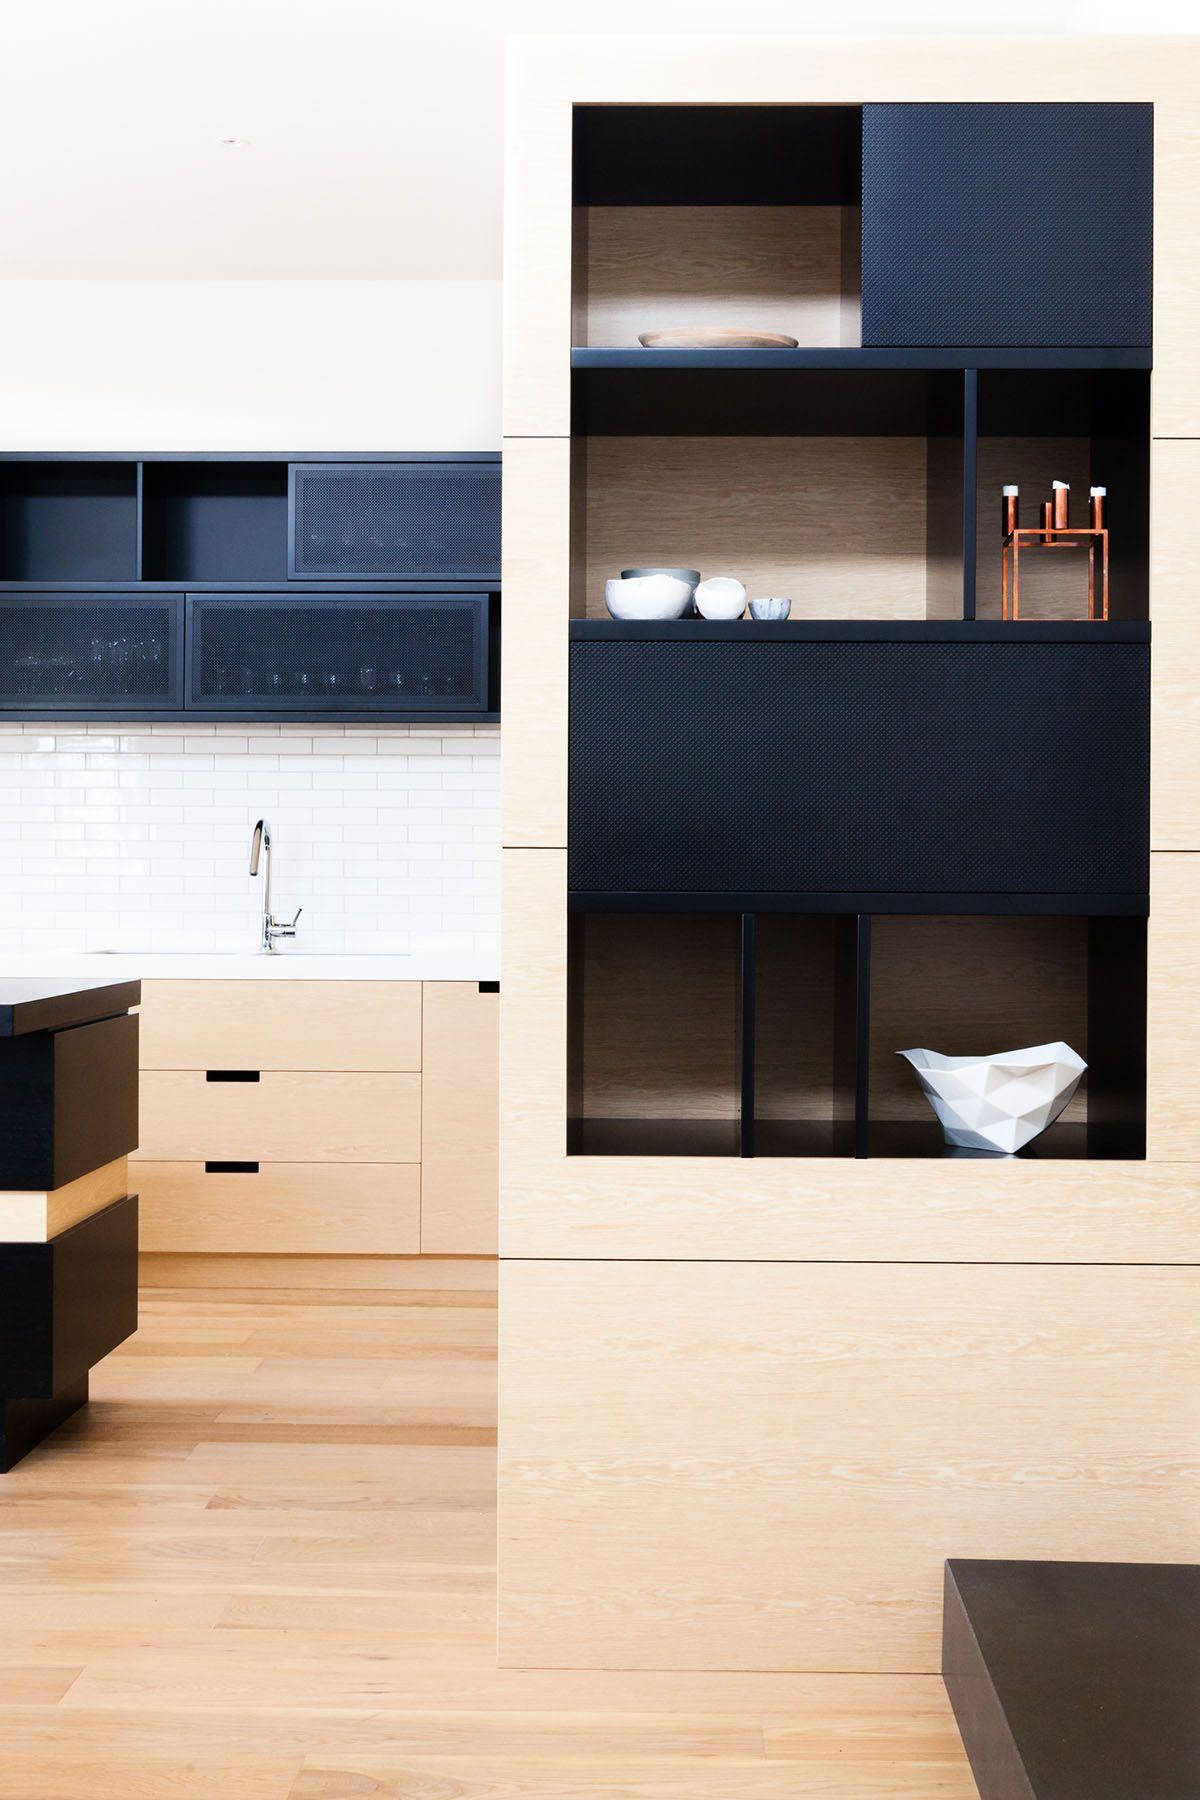 Light Wood Cabinets Doors Mixed W Black Doors Upstatehome